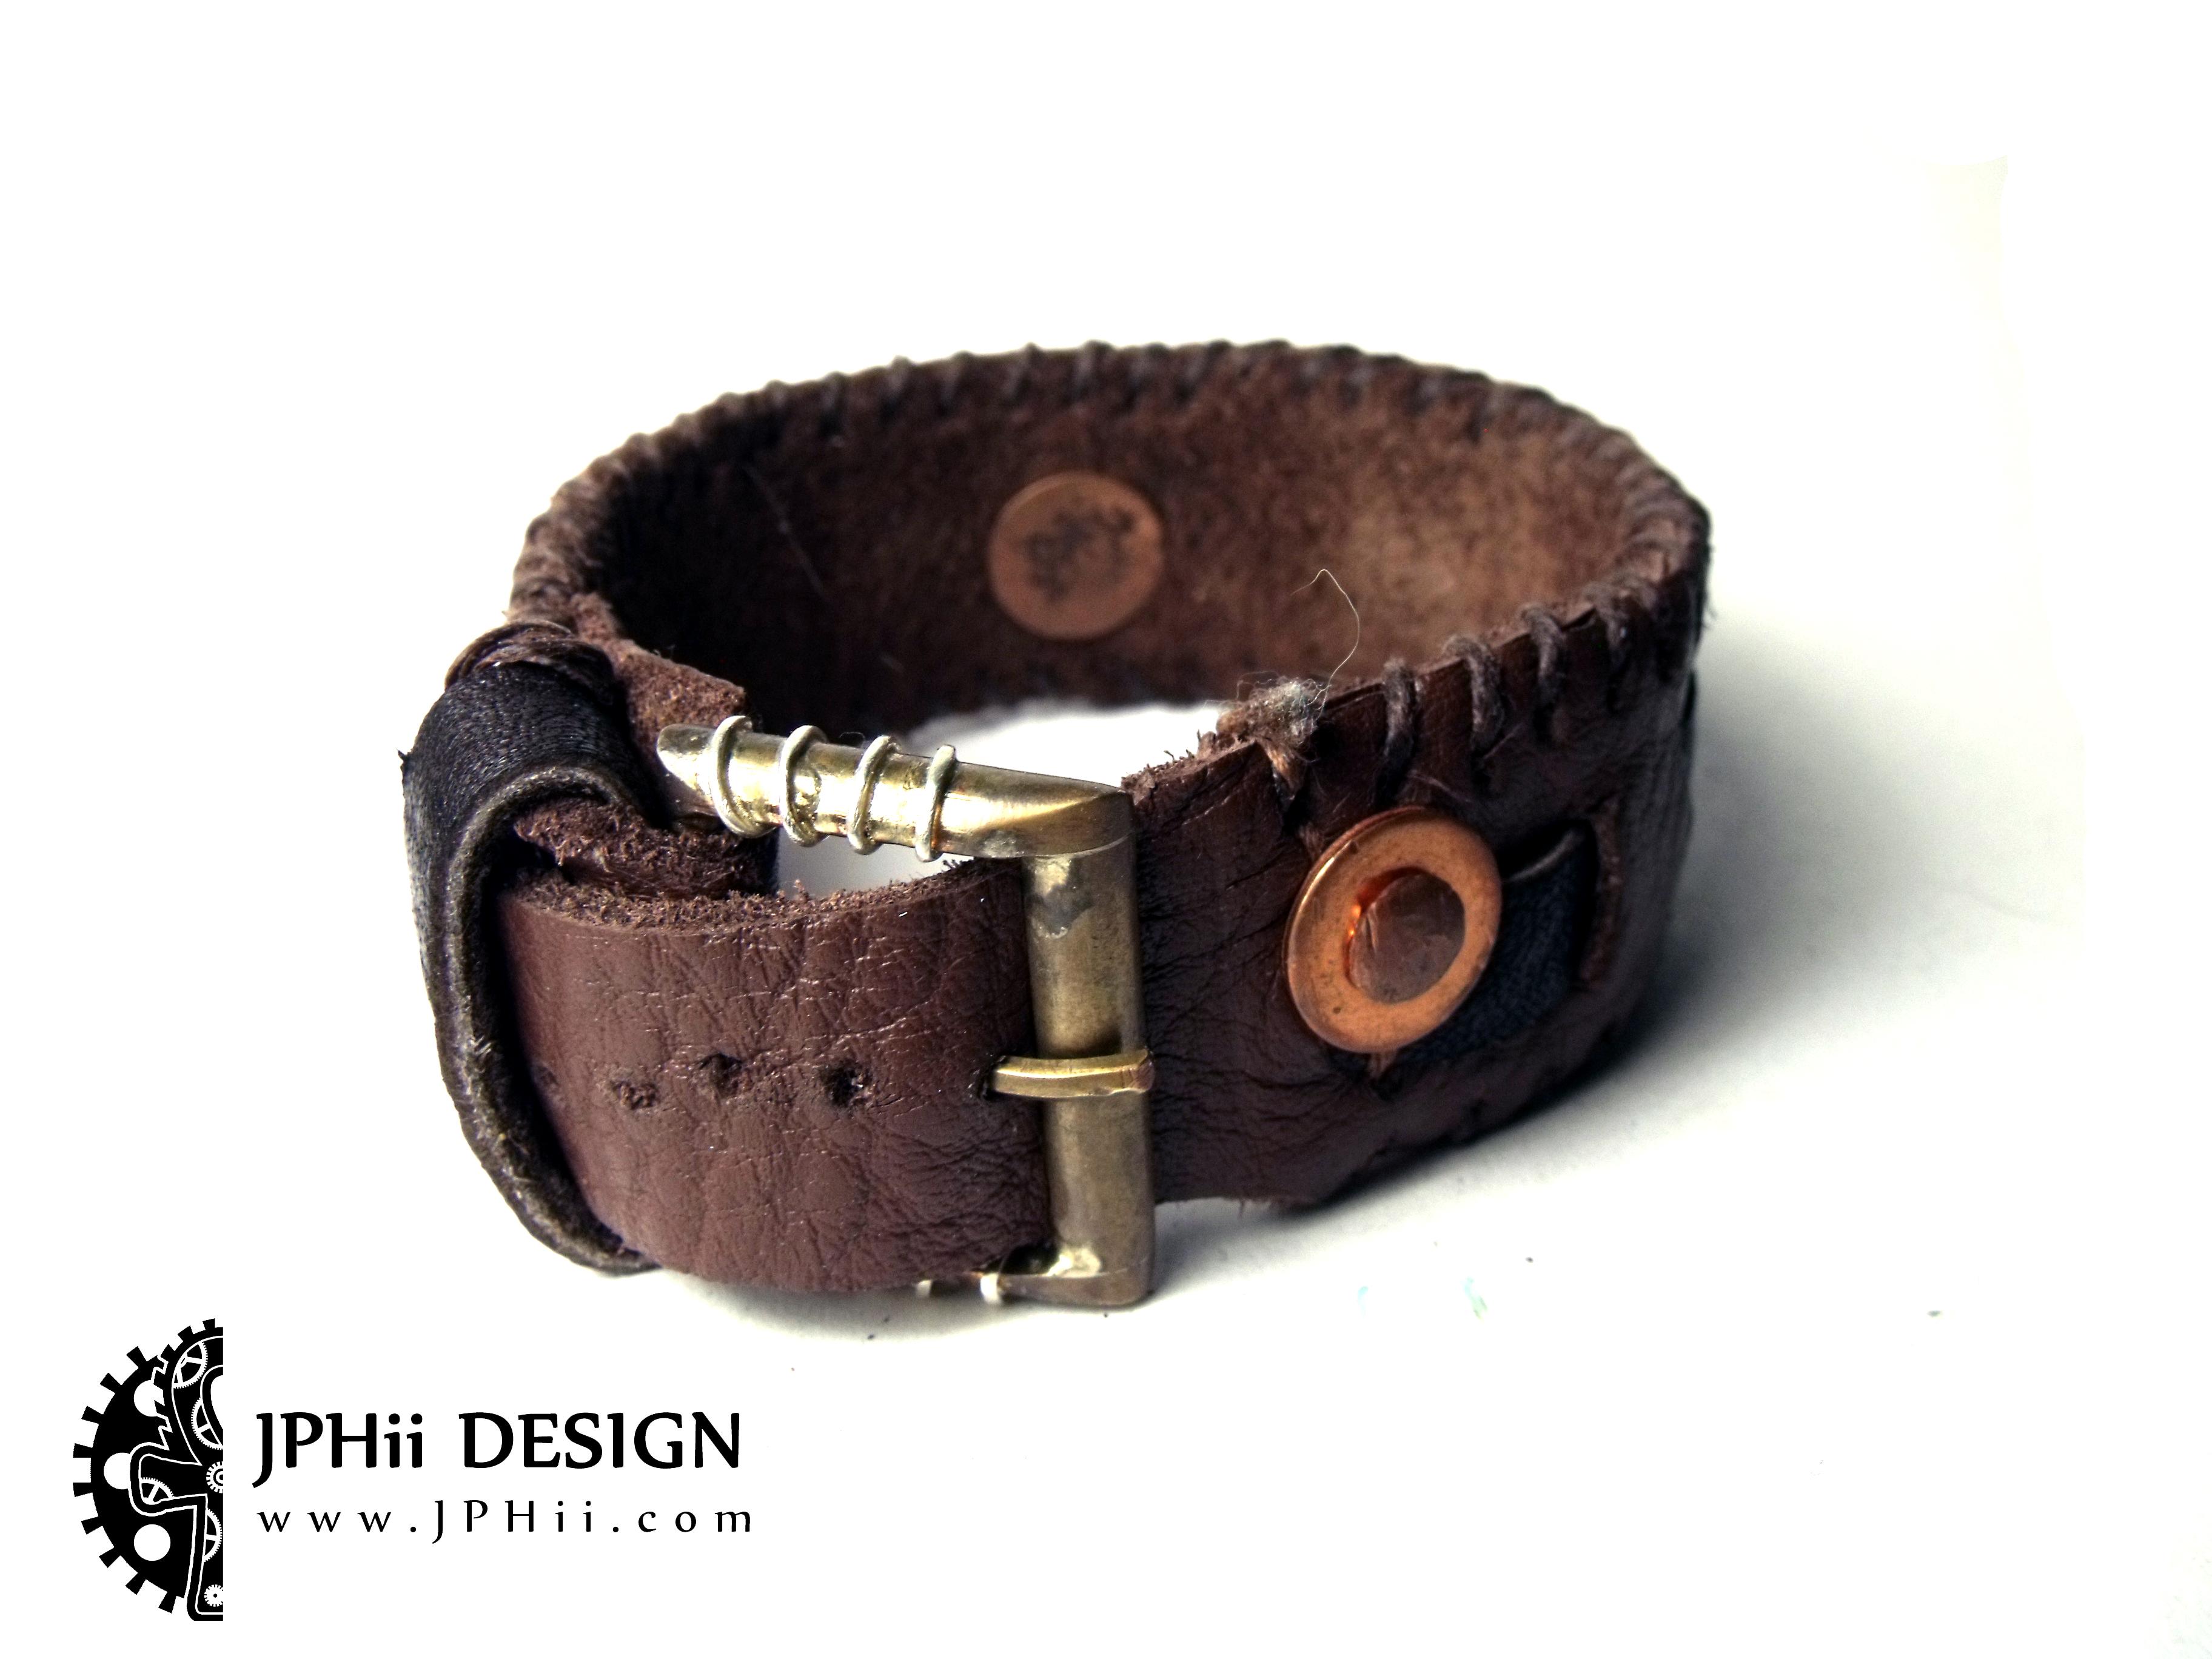 riveted_woven_leather_bracelet_bracelets_and_wristbands_2.jpg